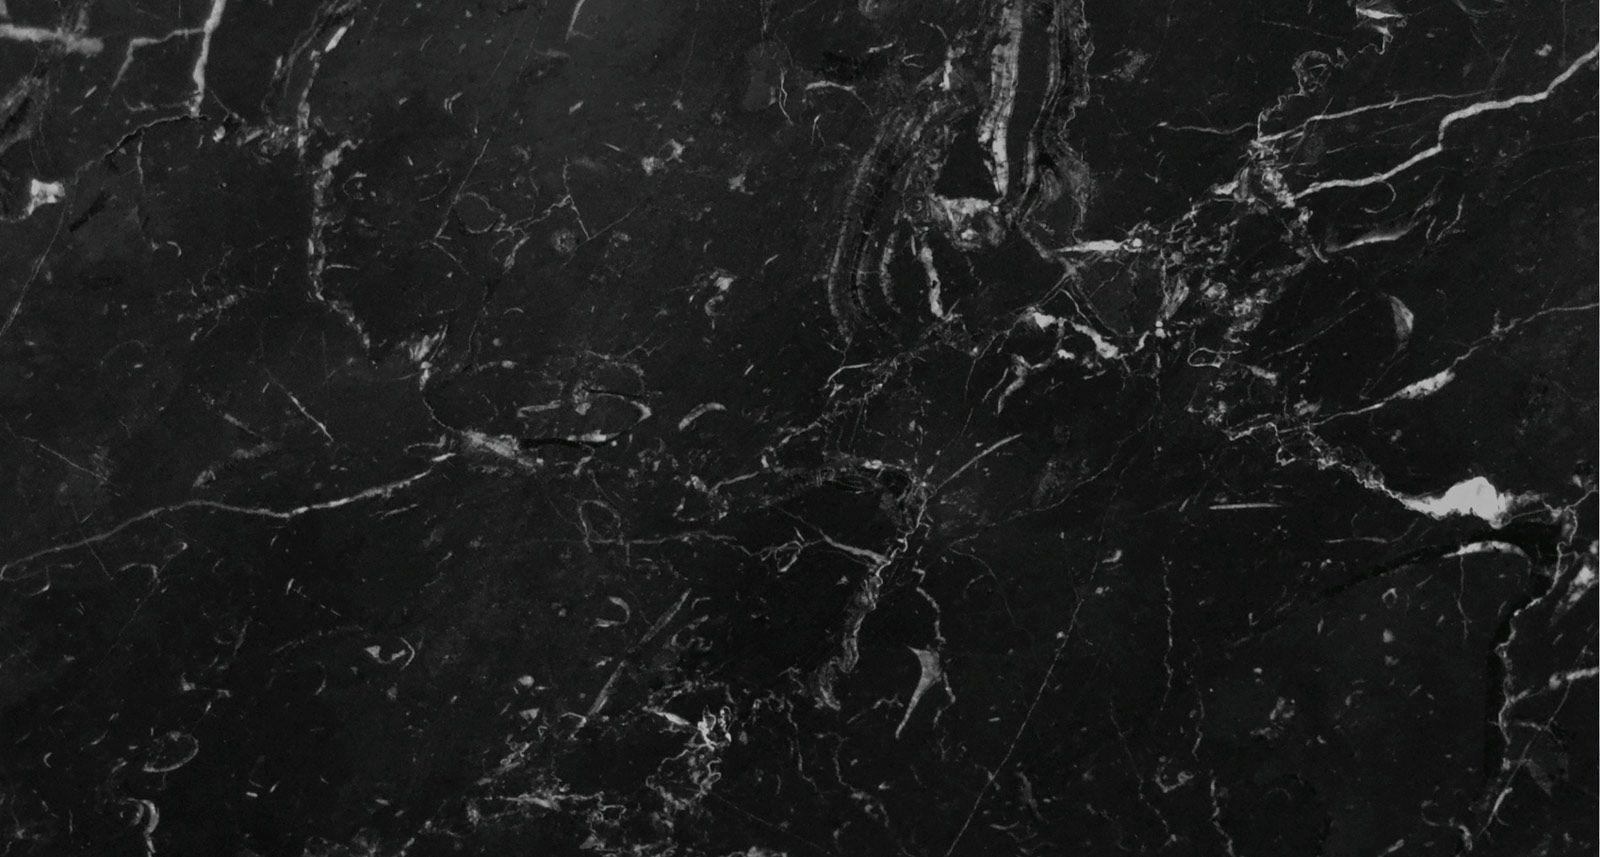 Pin de micha gwardys en tekstury pinterest marmol - Marmol negro marquina ...